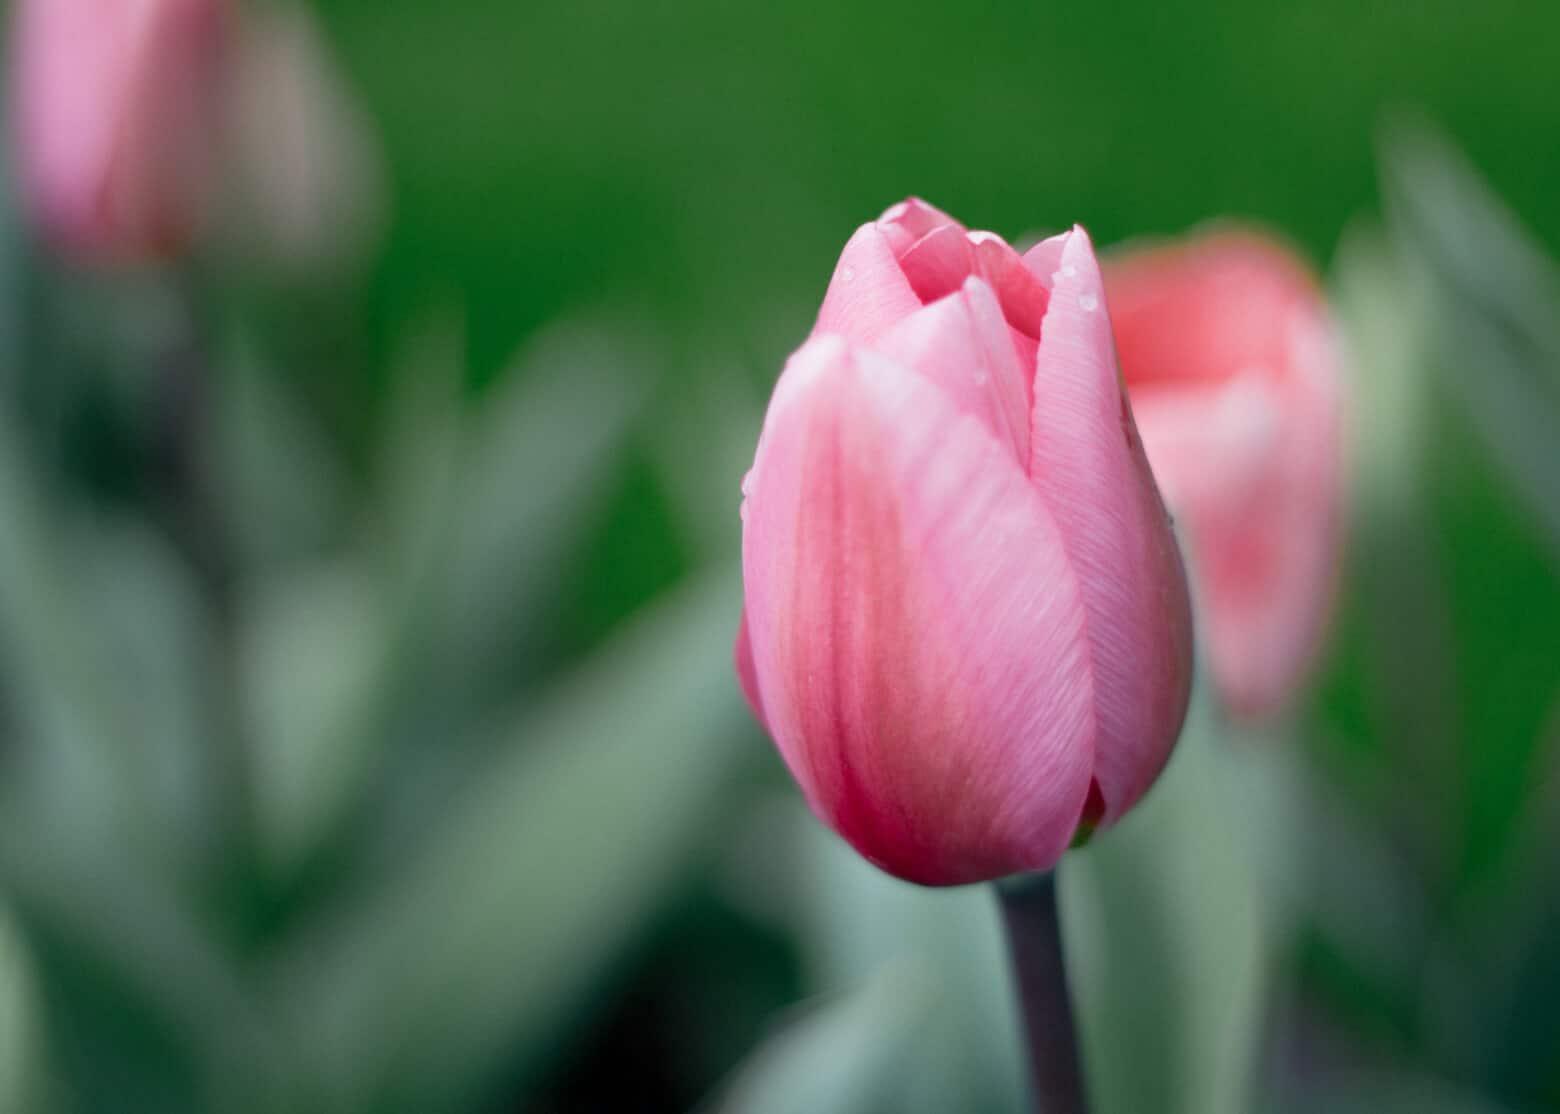 Dutch Flower Festival and Amsterdam Tulips - Netherlands